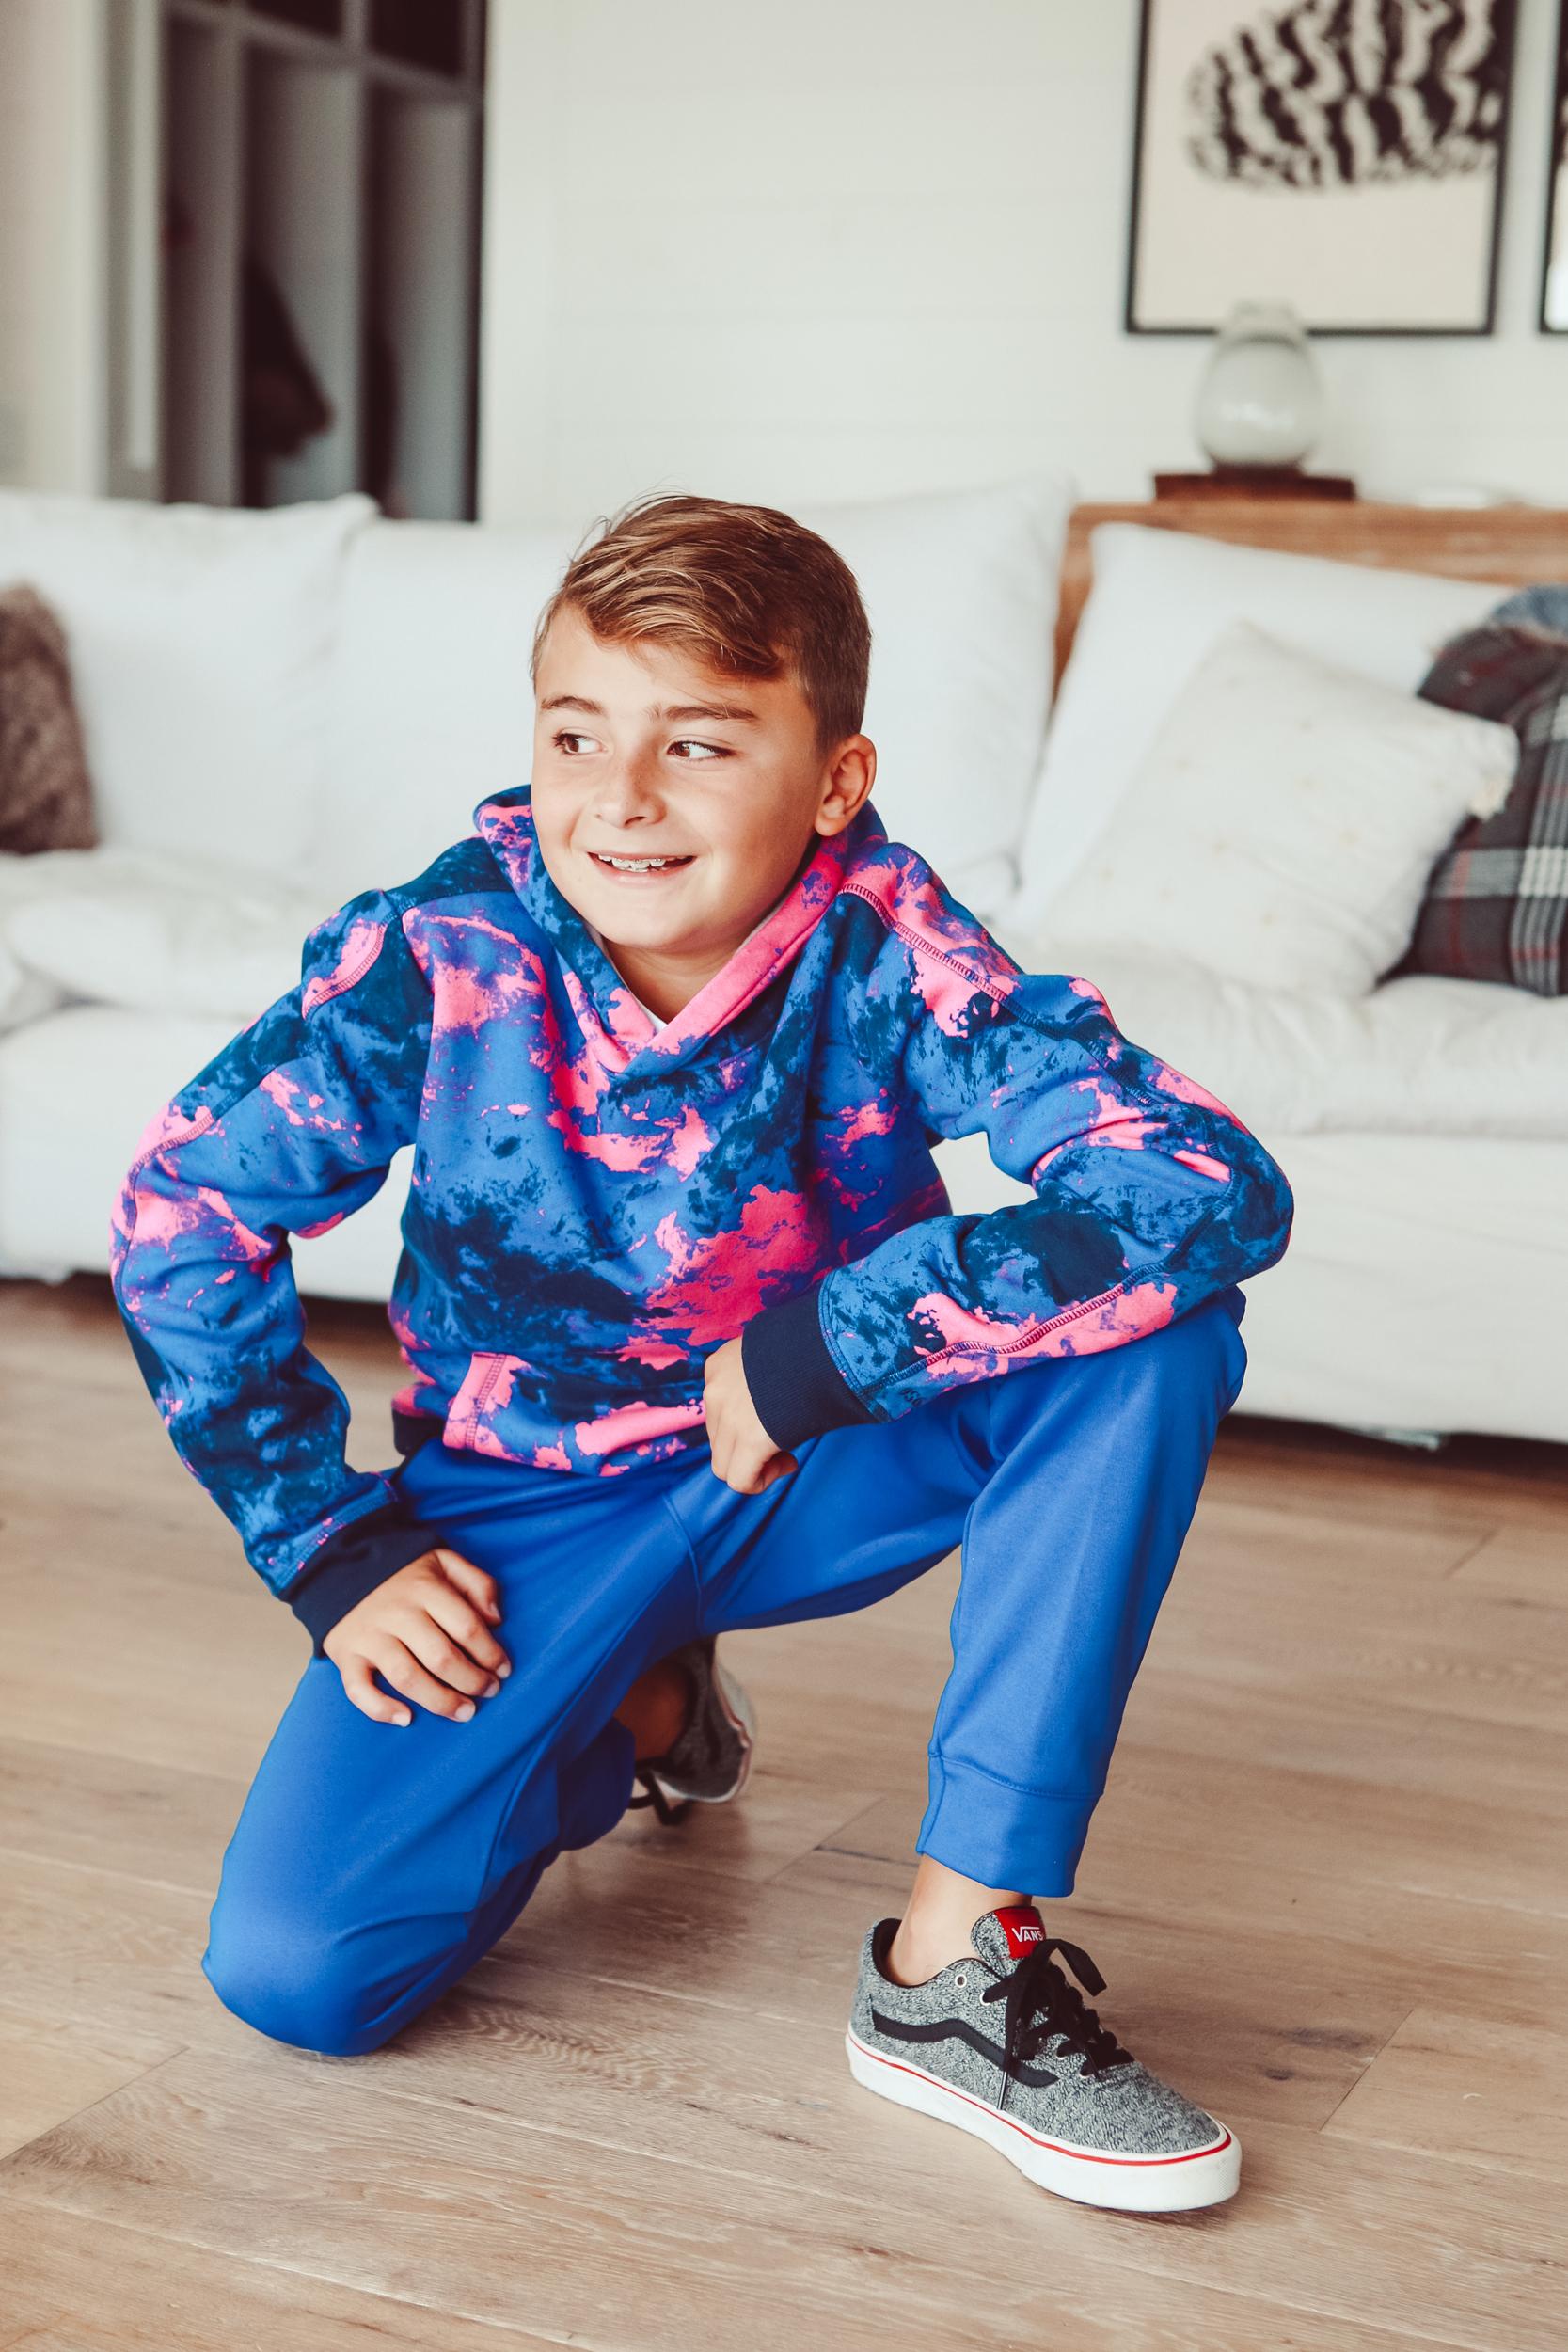 boy kneeling on floor